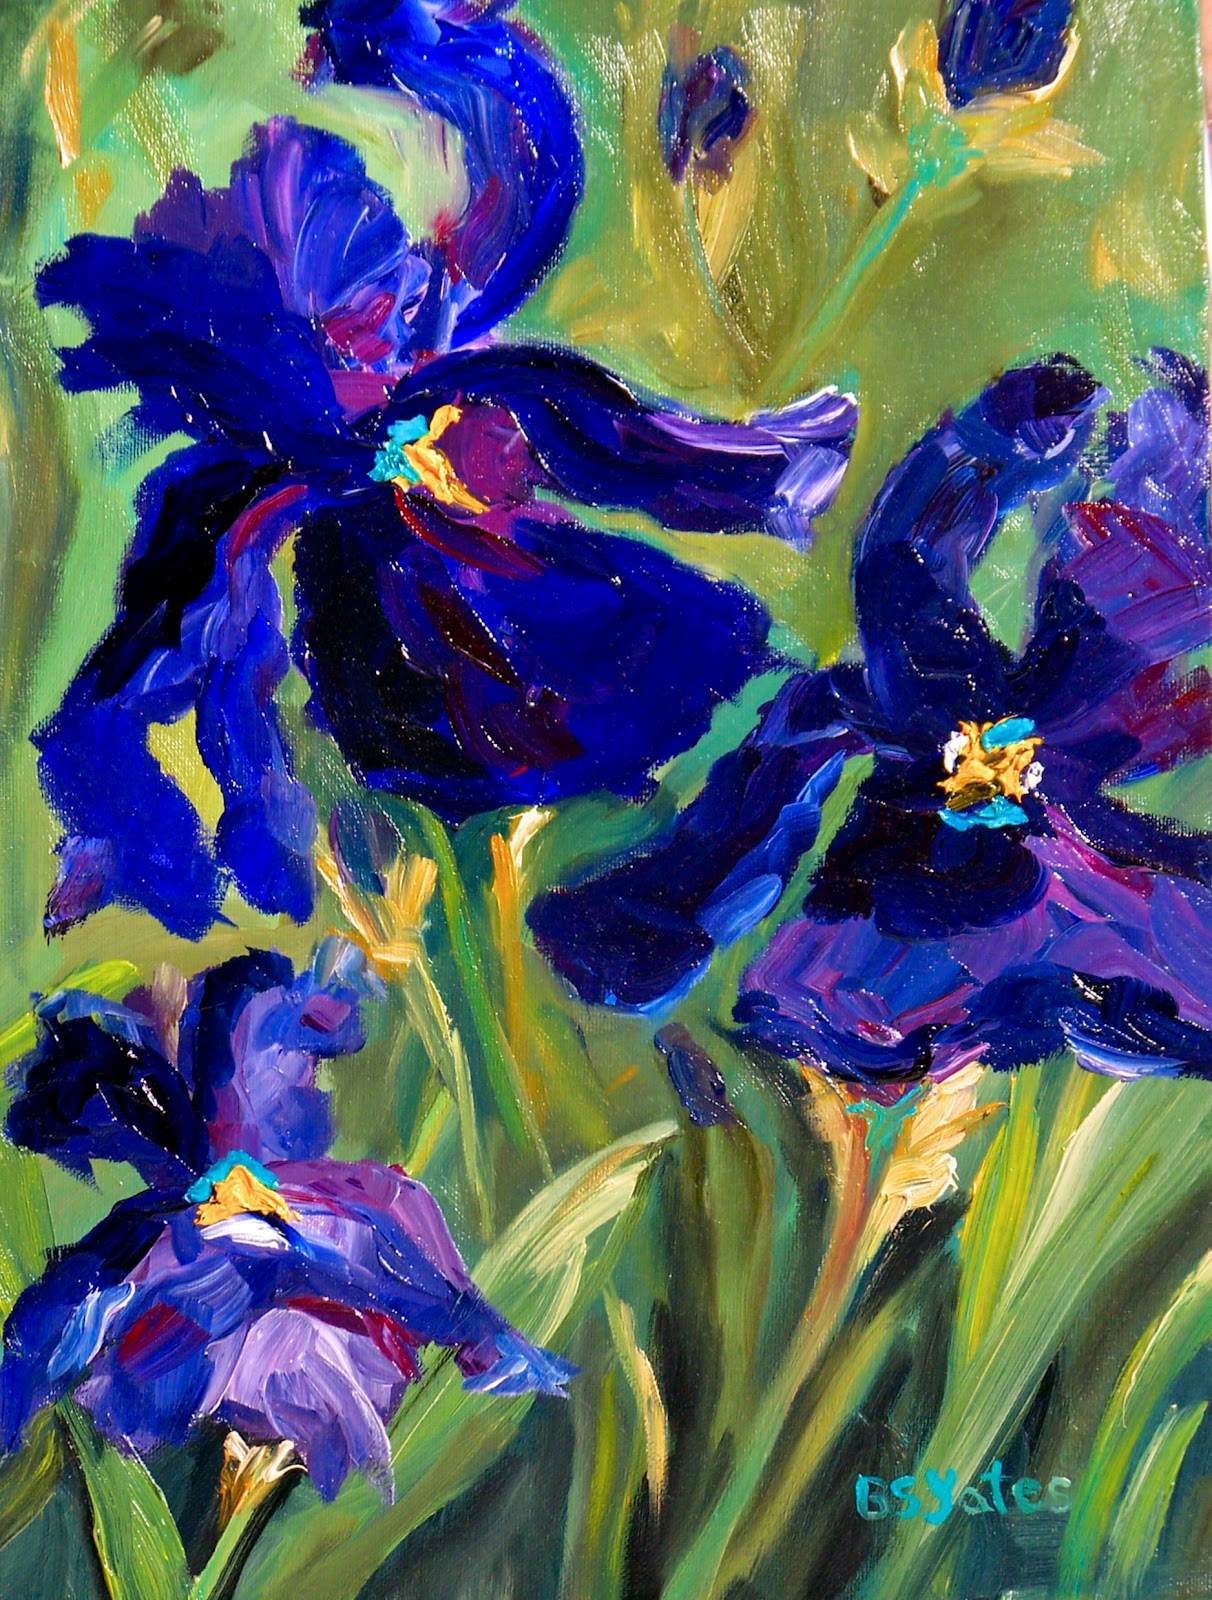 Blue Iris Painting Free Download bull Playapk co